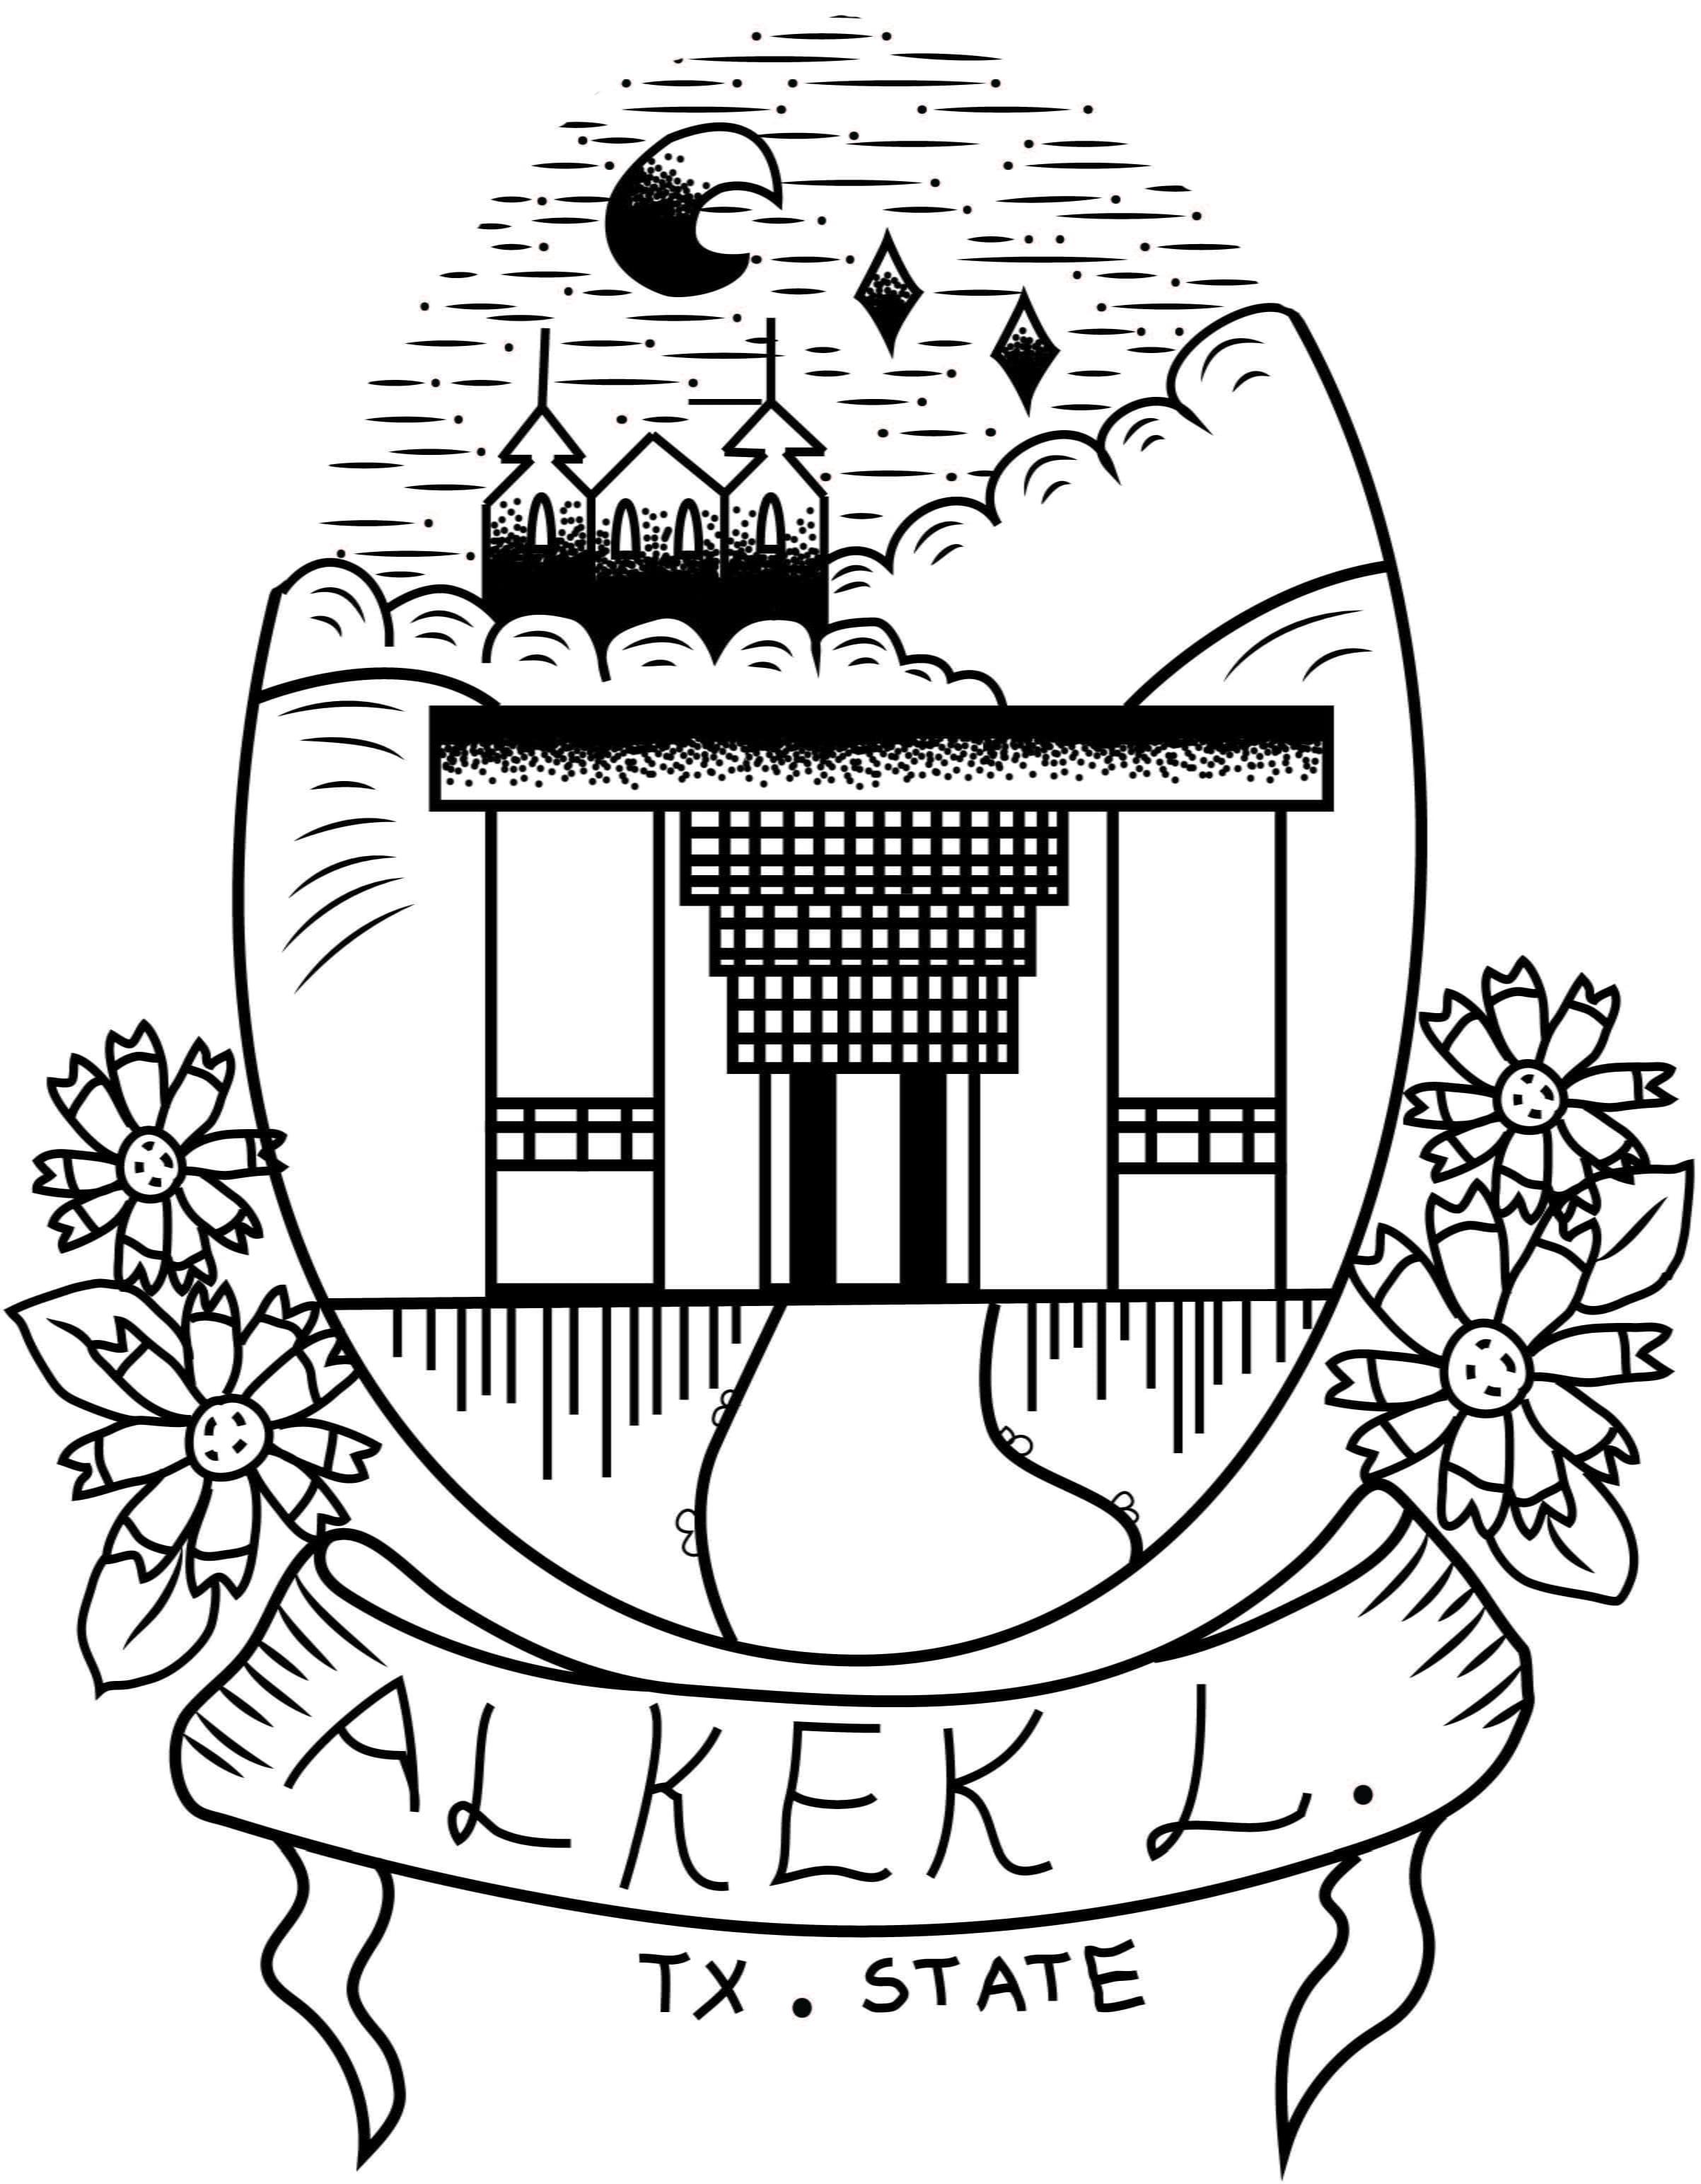 tattoo design - final version